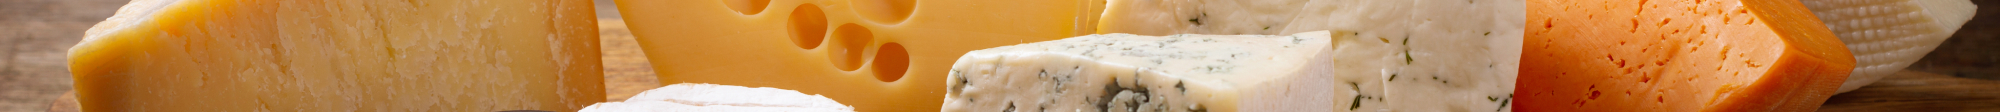 Comprar  quesos Tiernos gourmet online | Mixtura Gourmet